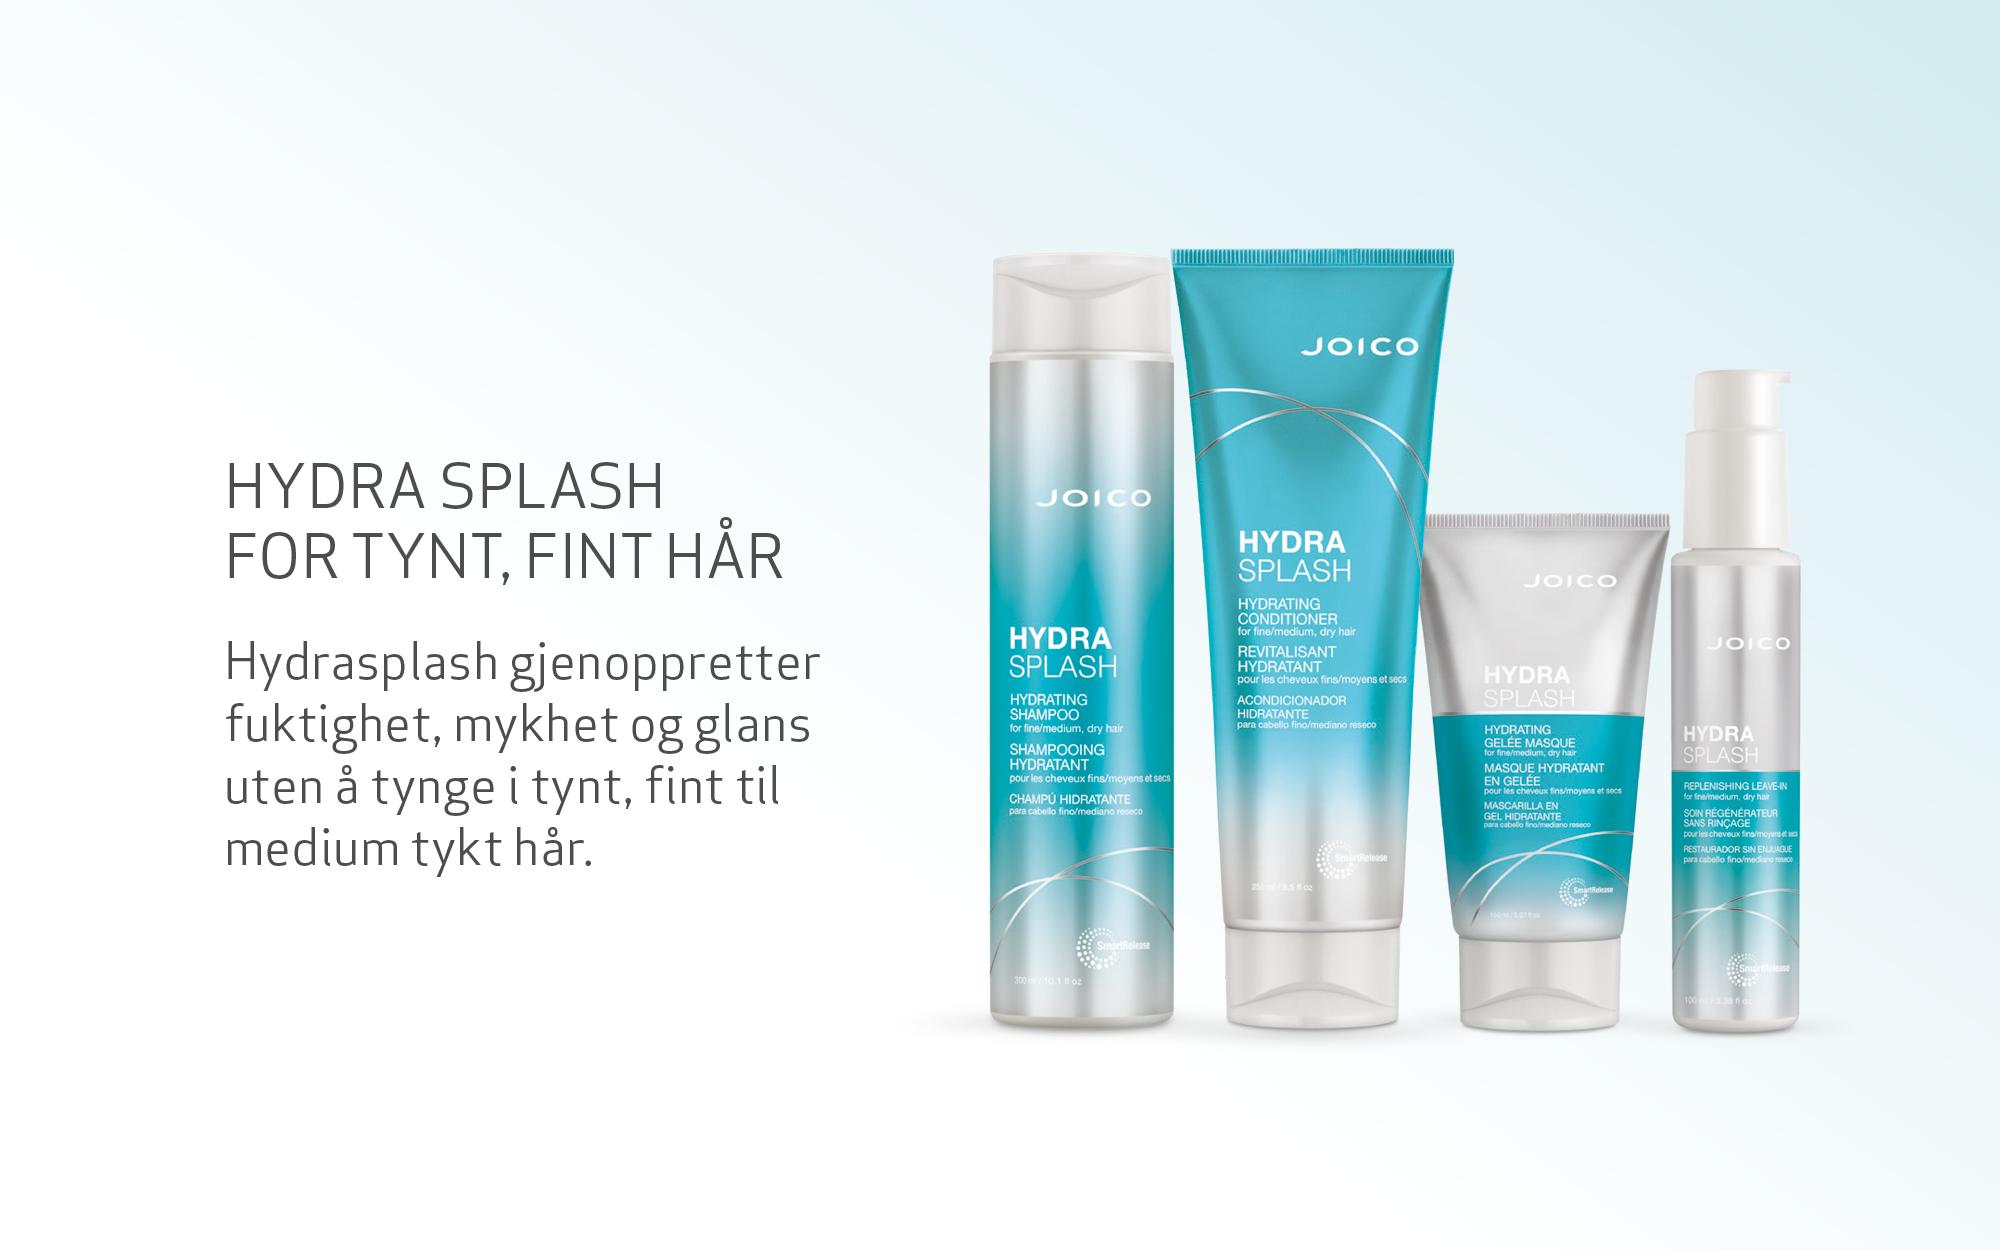 Joico Hydra Splash products